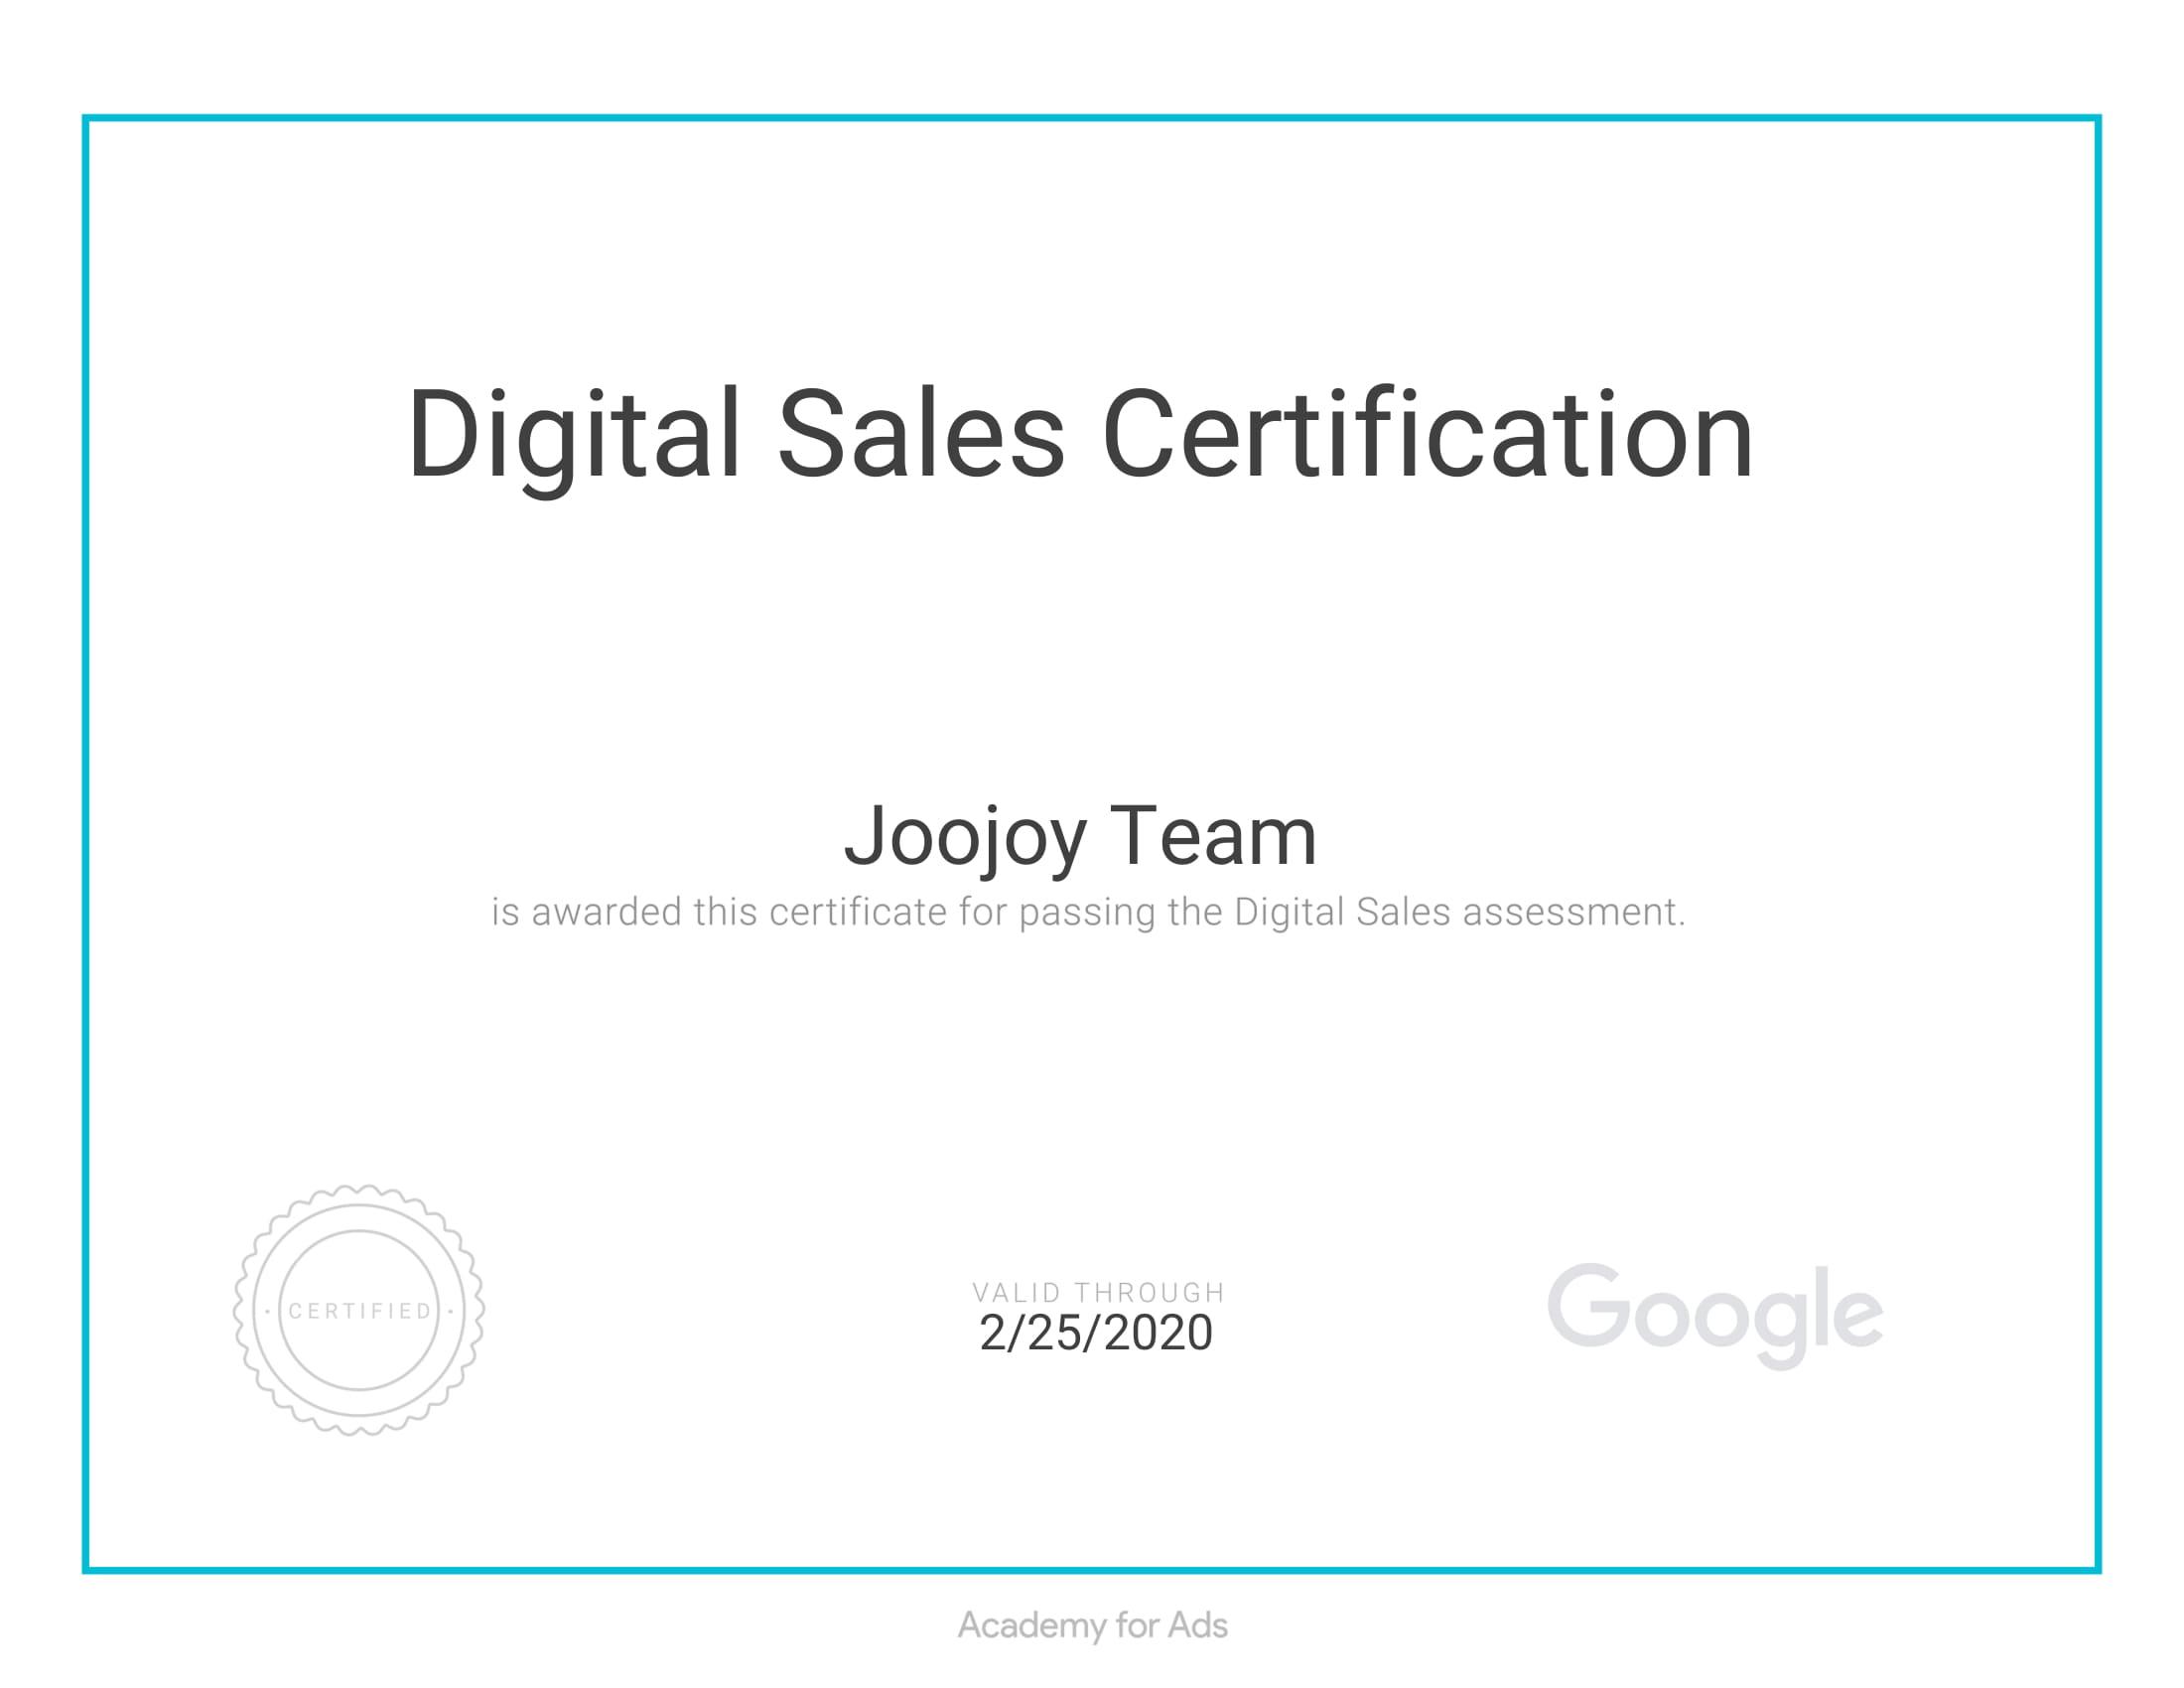 Digital Sales certificate